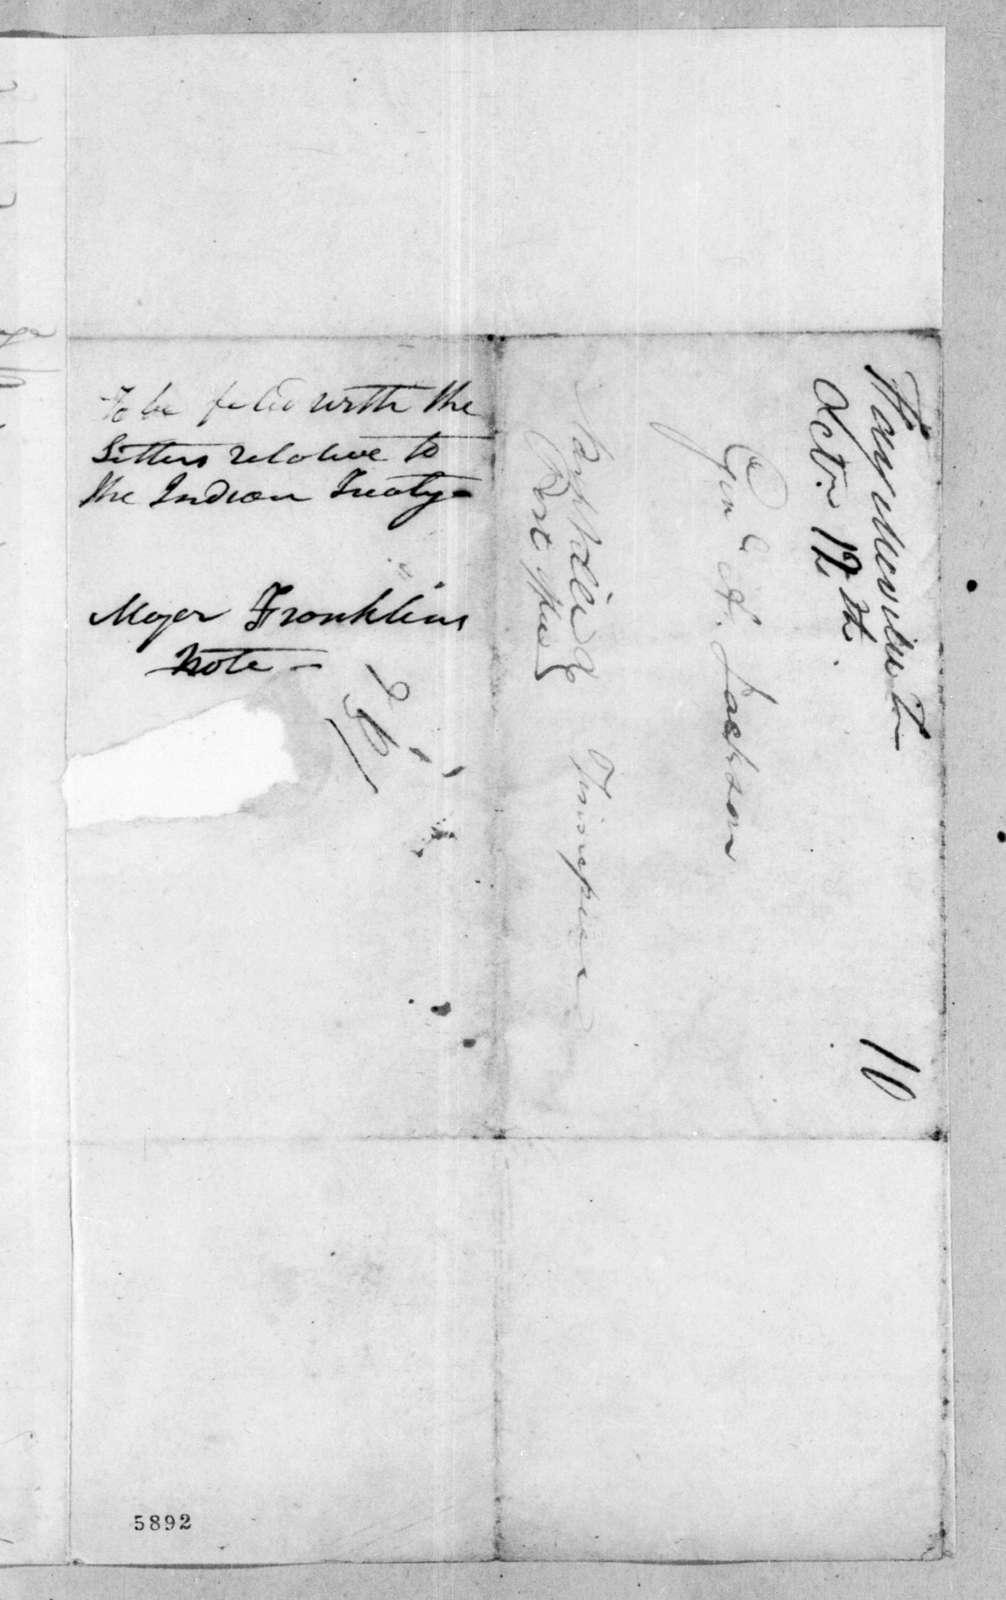 [Jesse Franklin] to Andrew Jackson, October 12, 1816